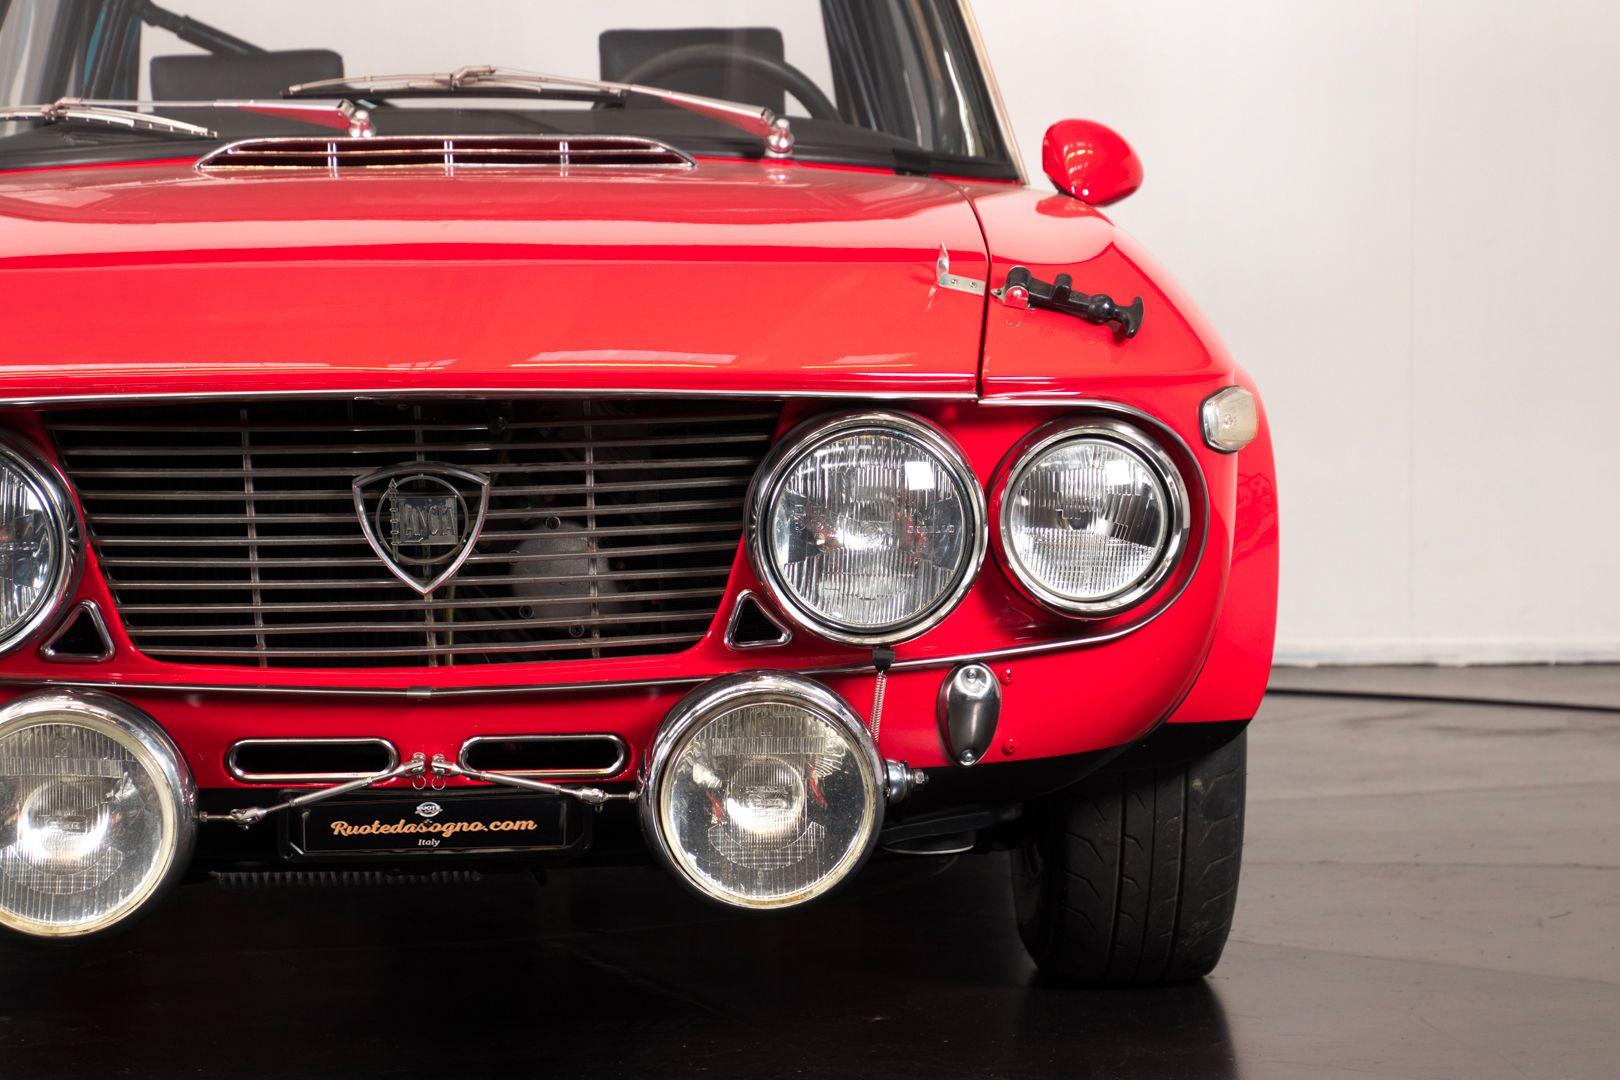 1970 Lancia Fulvia HF 1.6 - Gruppo 4 18810